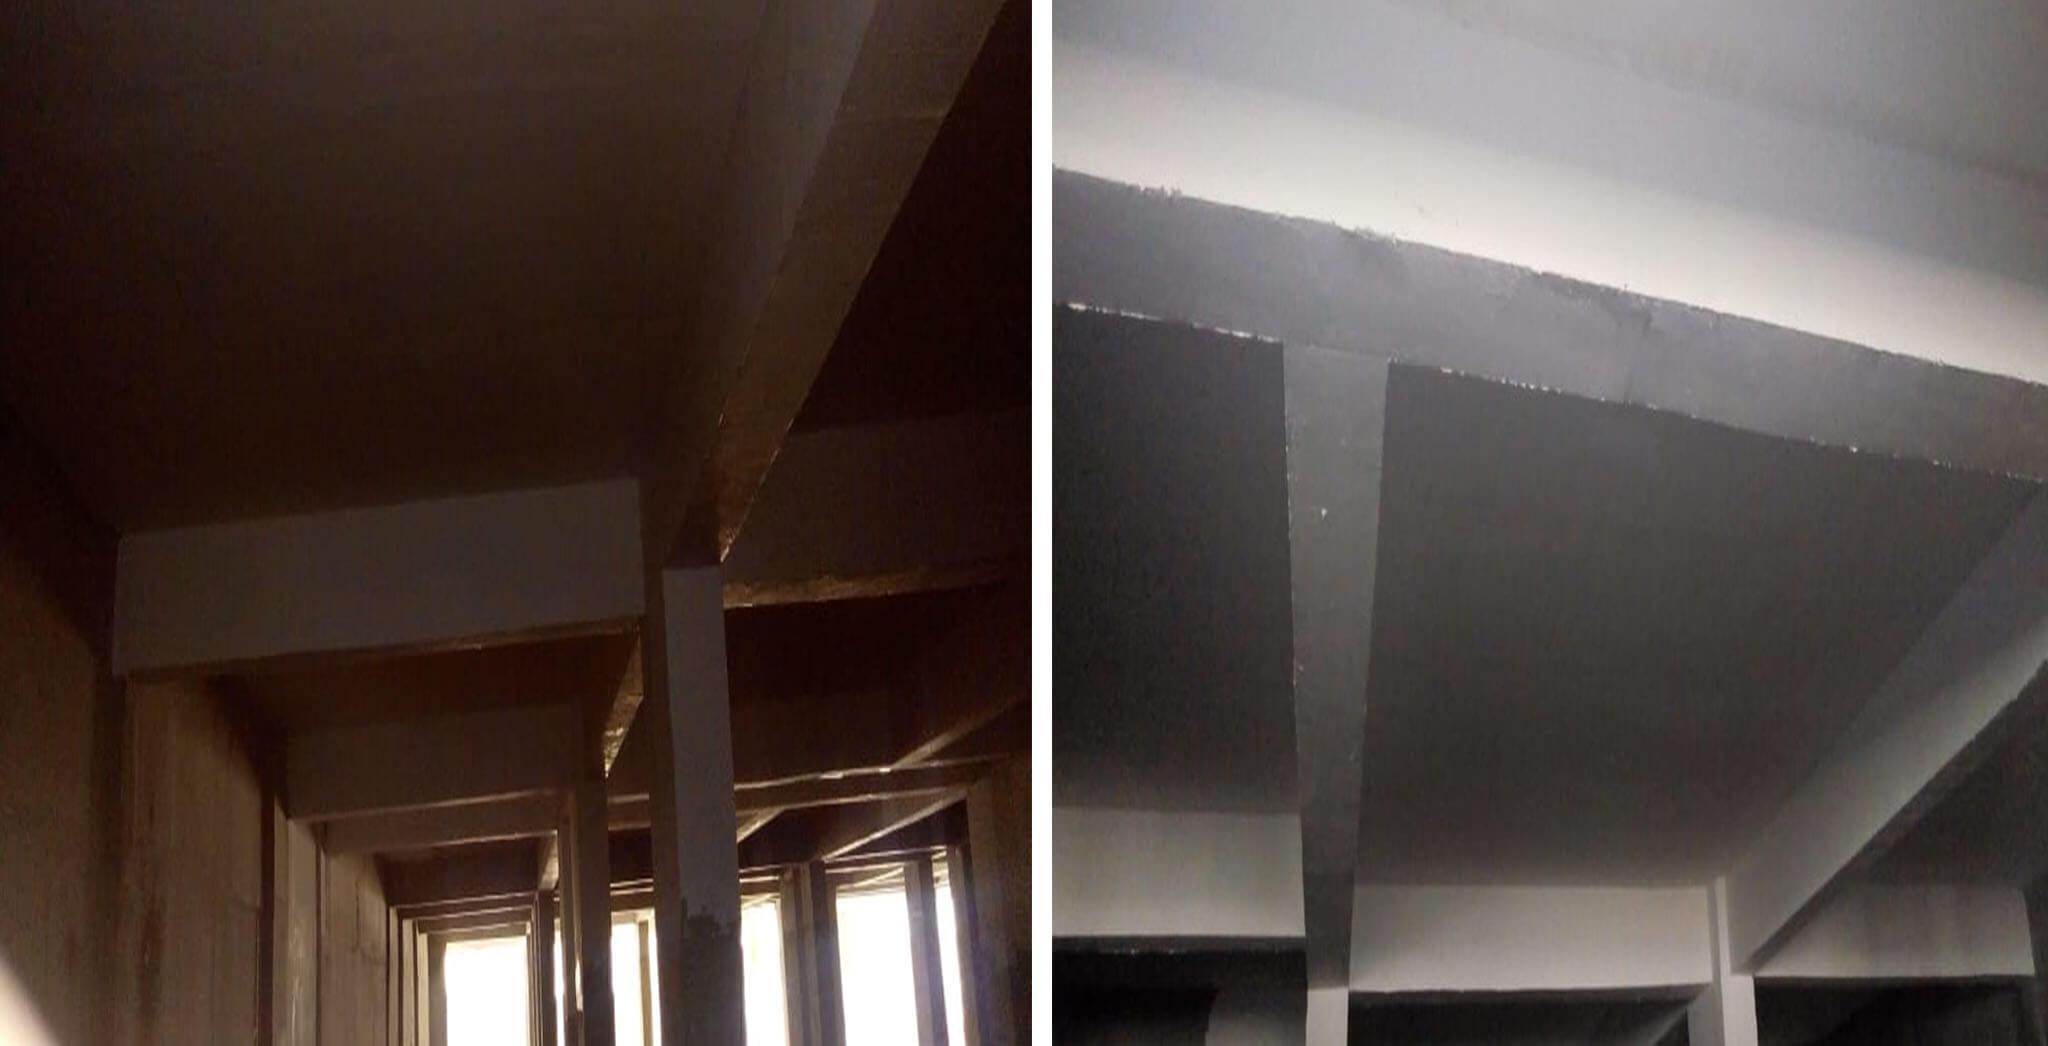 Jun 2019 - Tower F—Lower basement: Putty work-in-progress